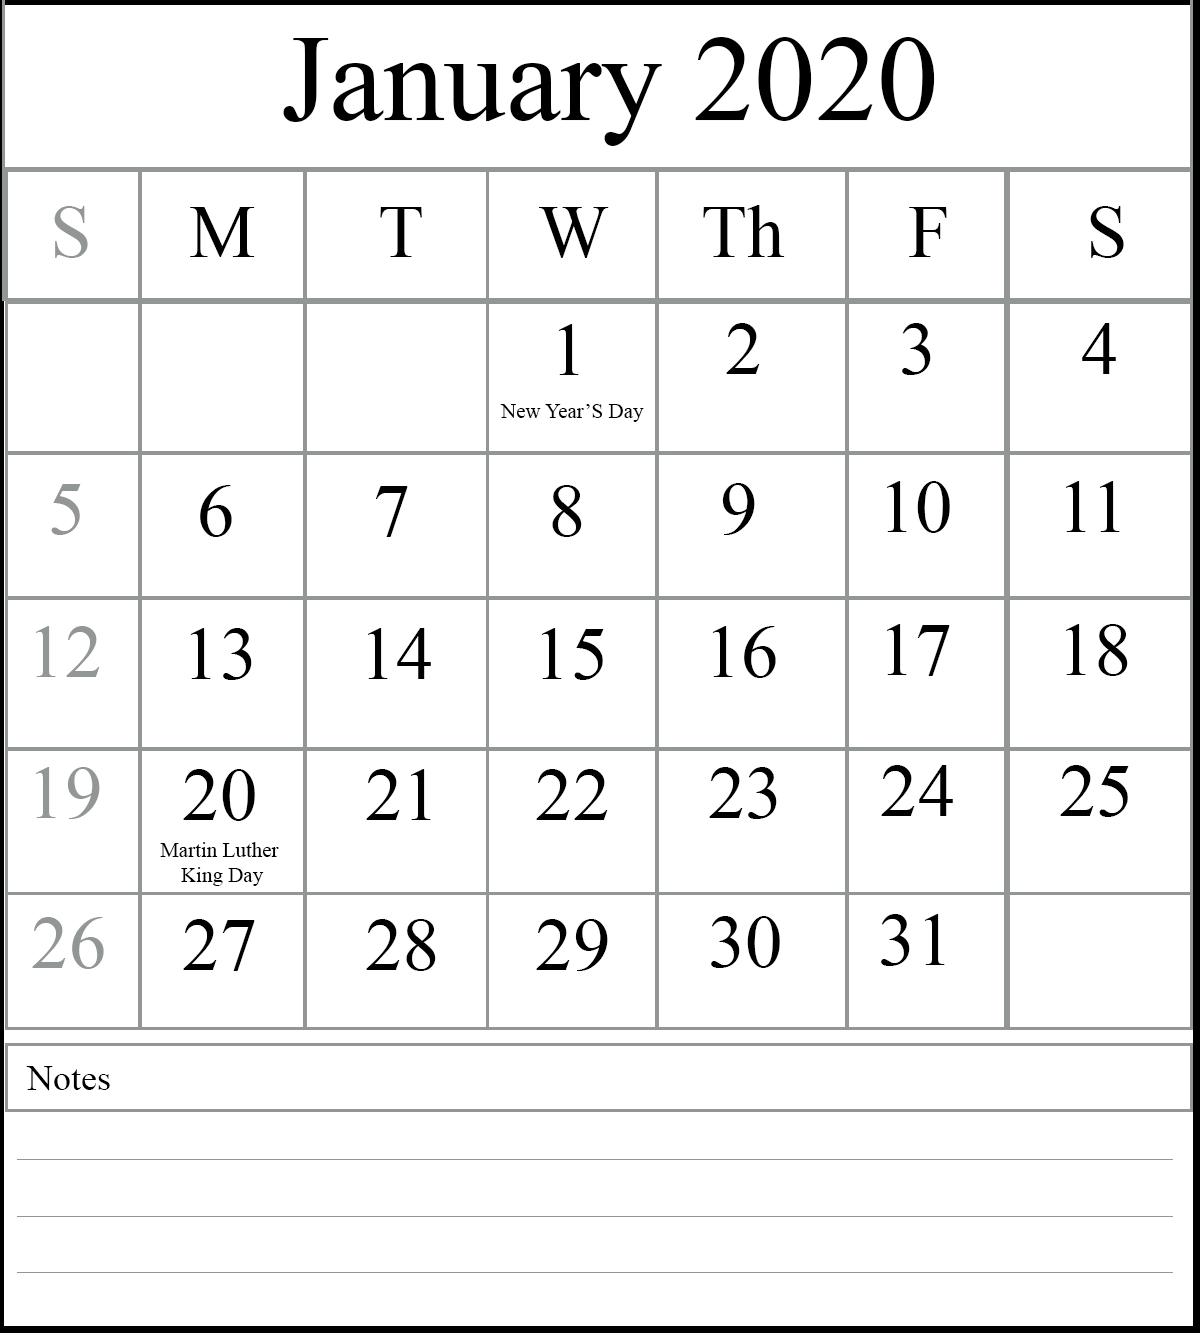 Free January 2020 Printable Calendar In Pdf, Excel & Word-Printable Calendar 2020 Monthly Bills